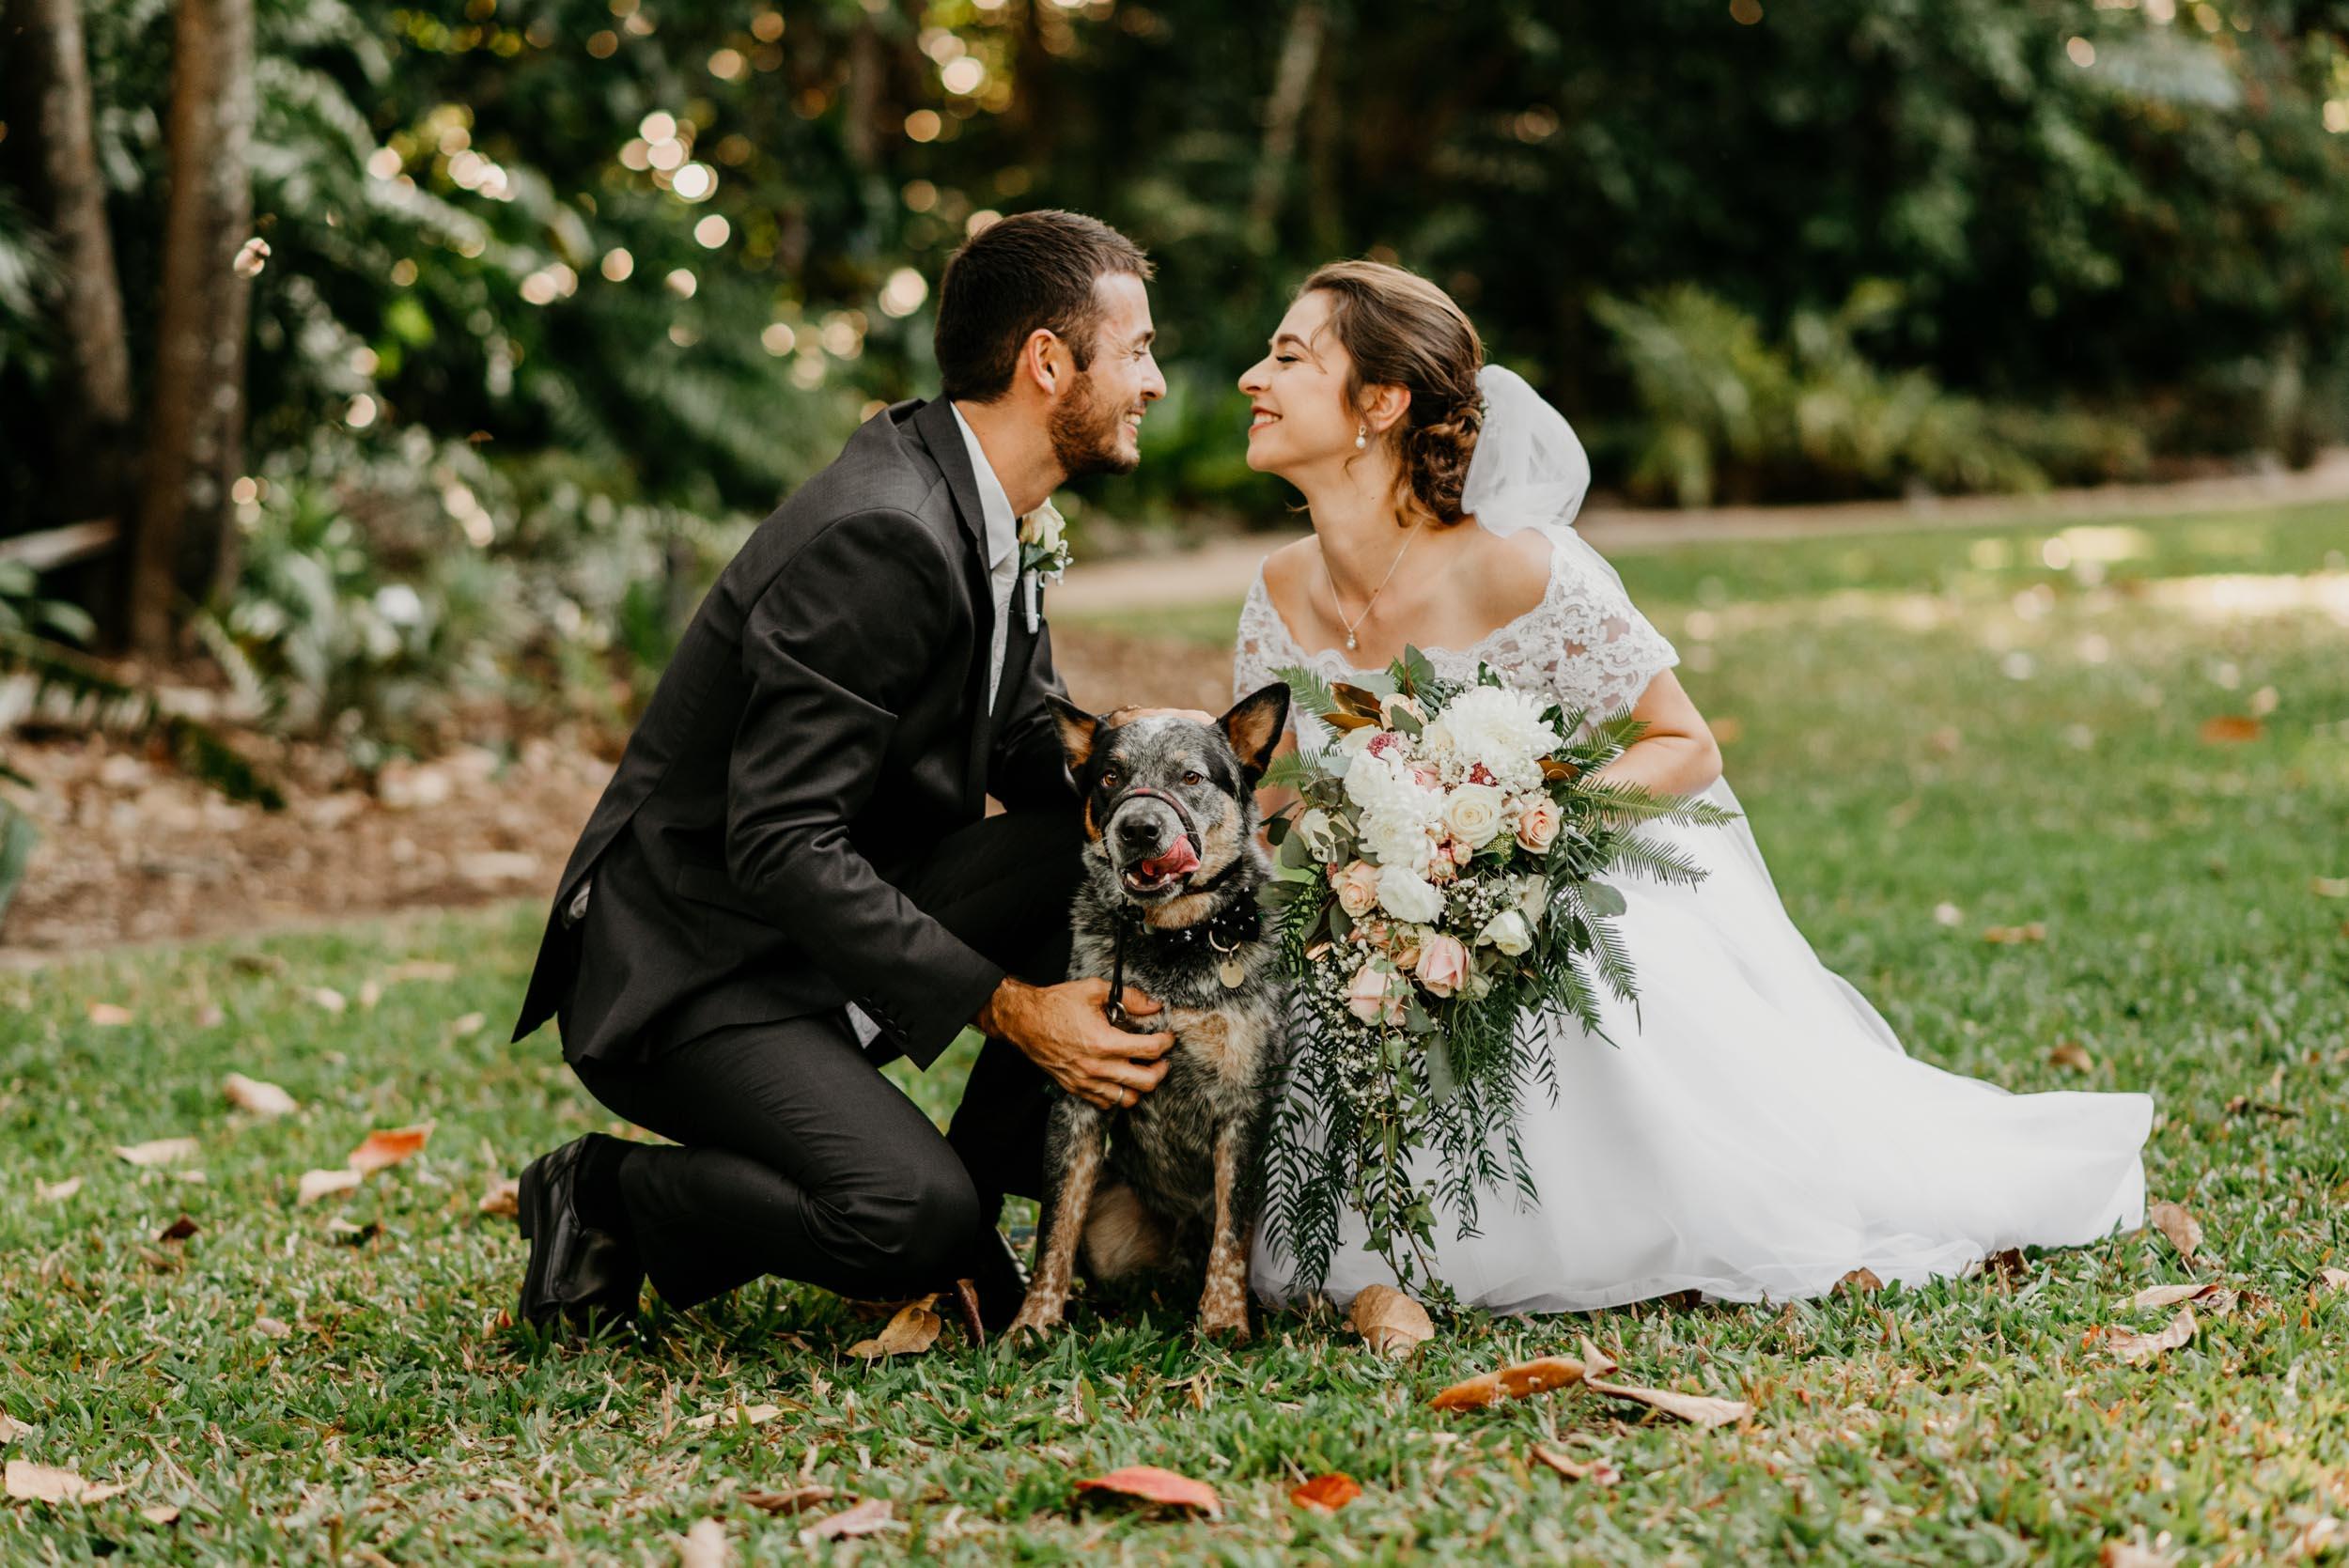 The Raw Photographer - Cairns and Port Douglas Wedding Photographer - Best of 2018-49.jpg